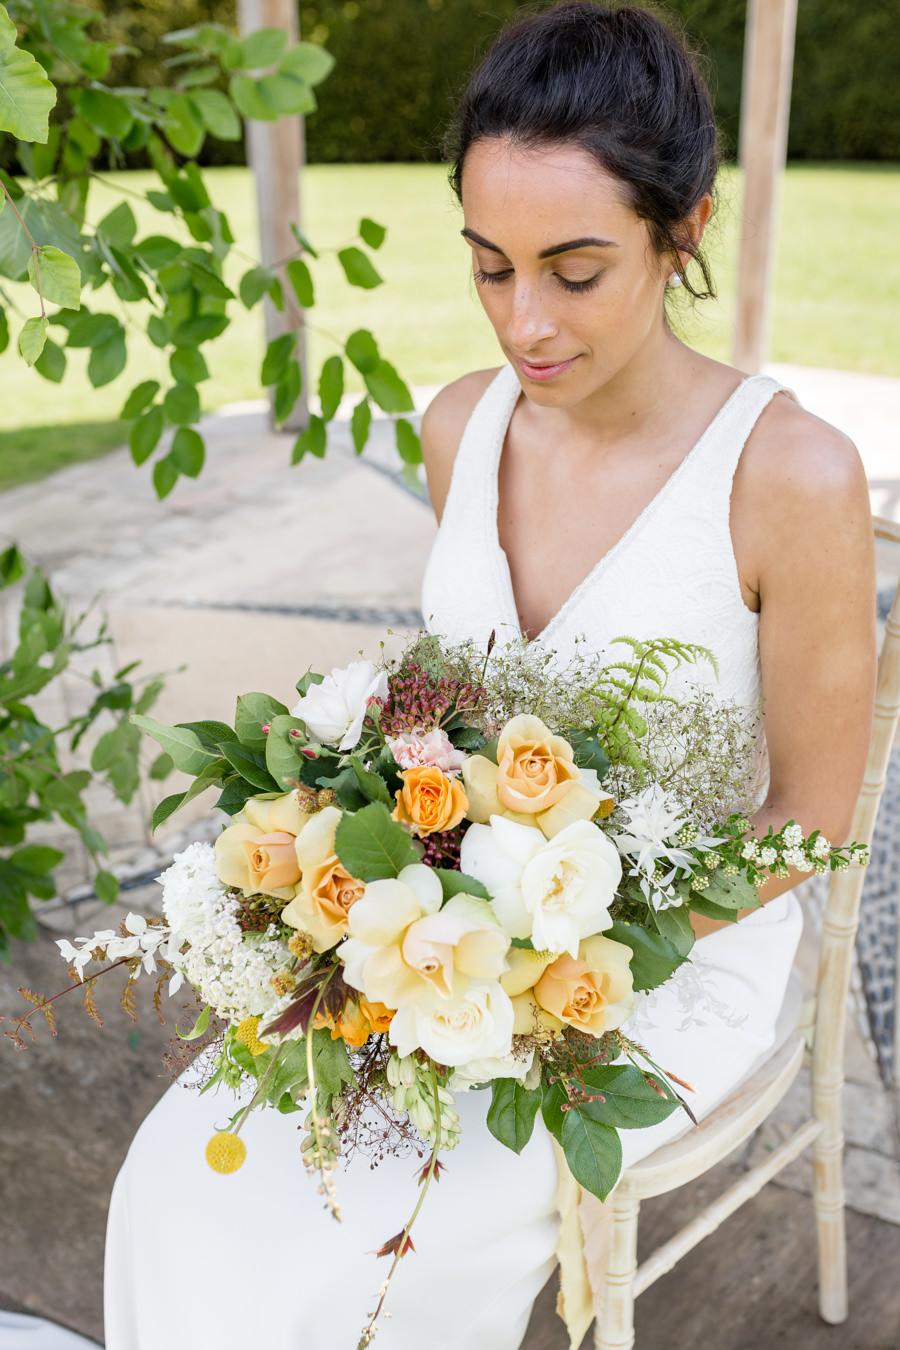 Boho luxe wedding style with soft orange and muted tones at Chippenham, image credit Heather Jackson Photography (19)